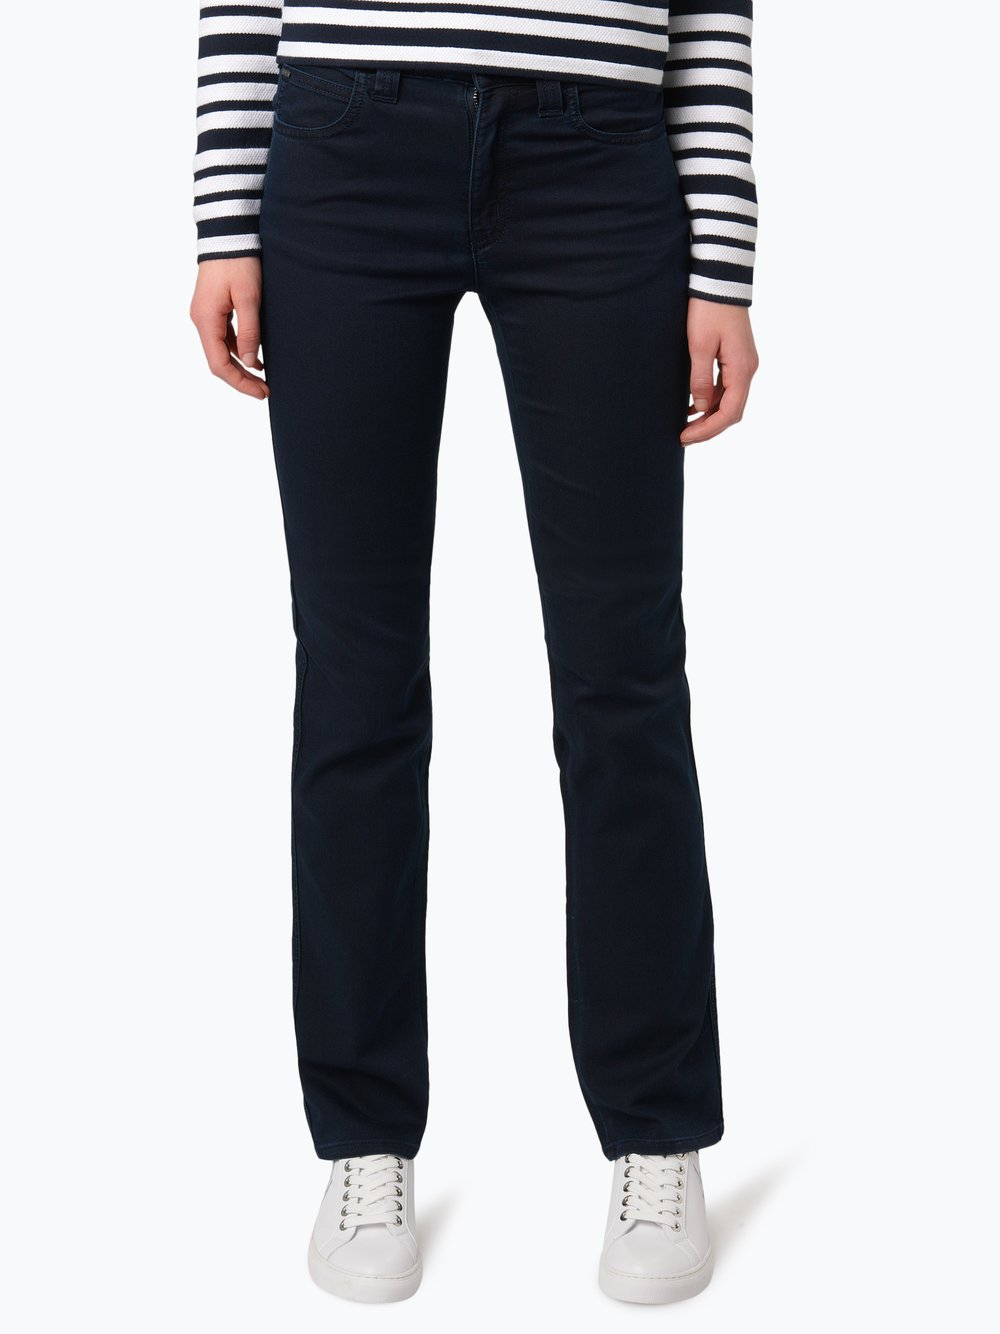 Armani Jeans Damen Jeans - J75 Rose  2  online kaufen   PEEK-UND ... 391c0030f1